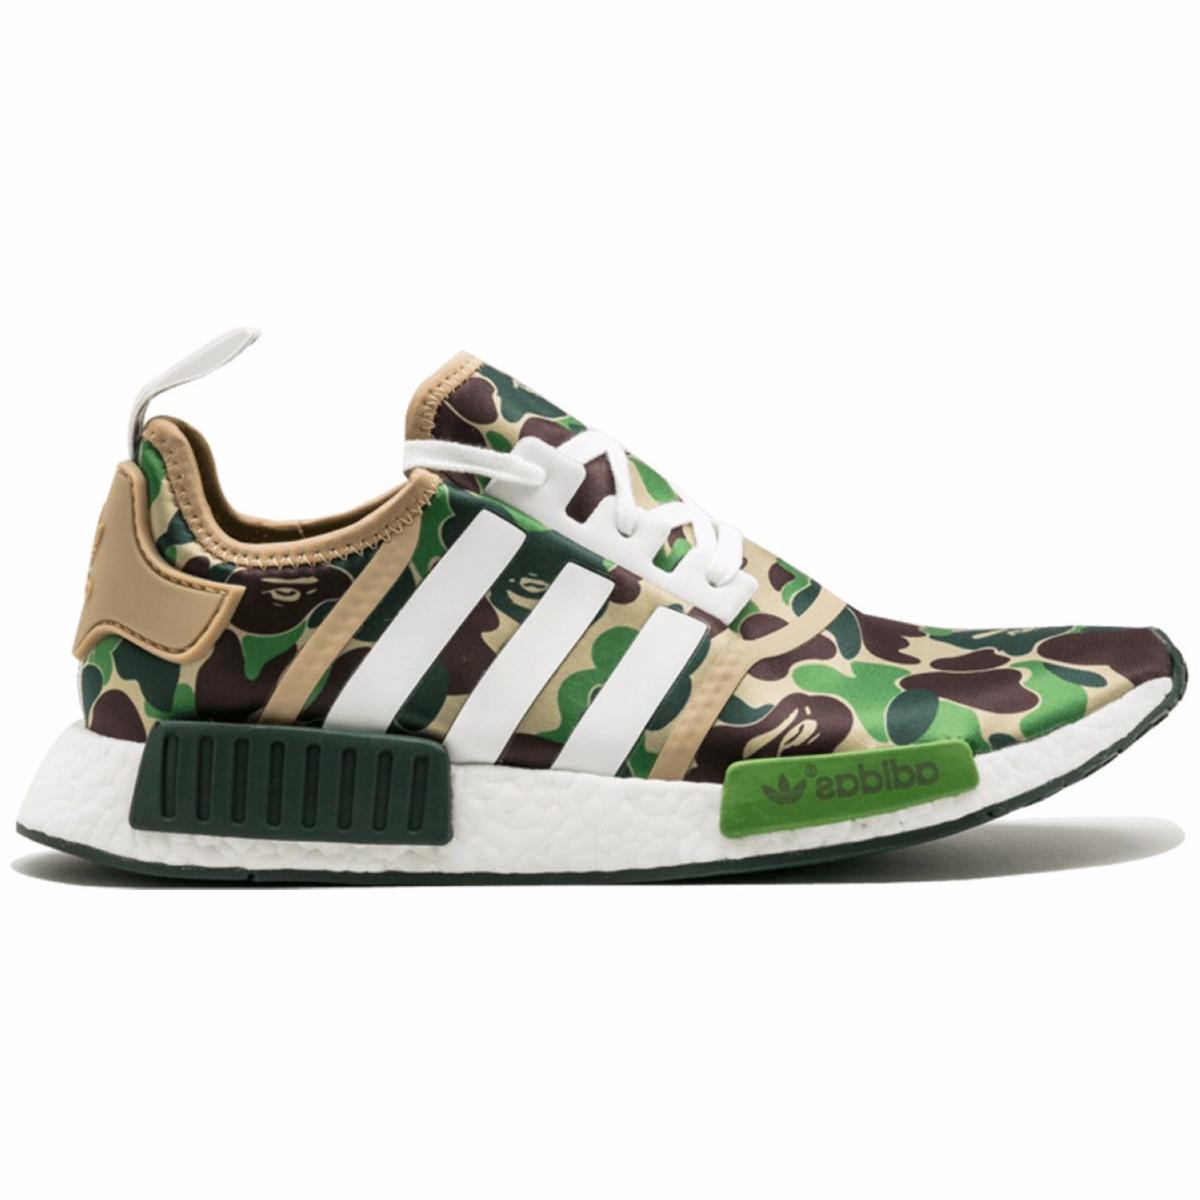 R Adidas Shoes